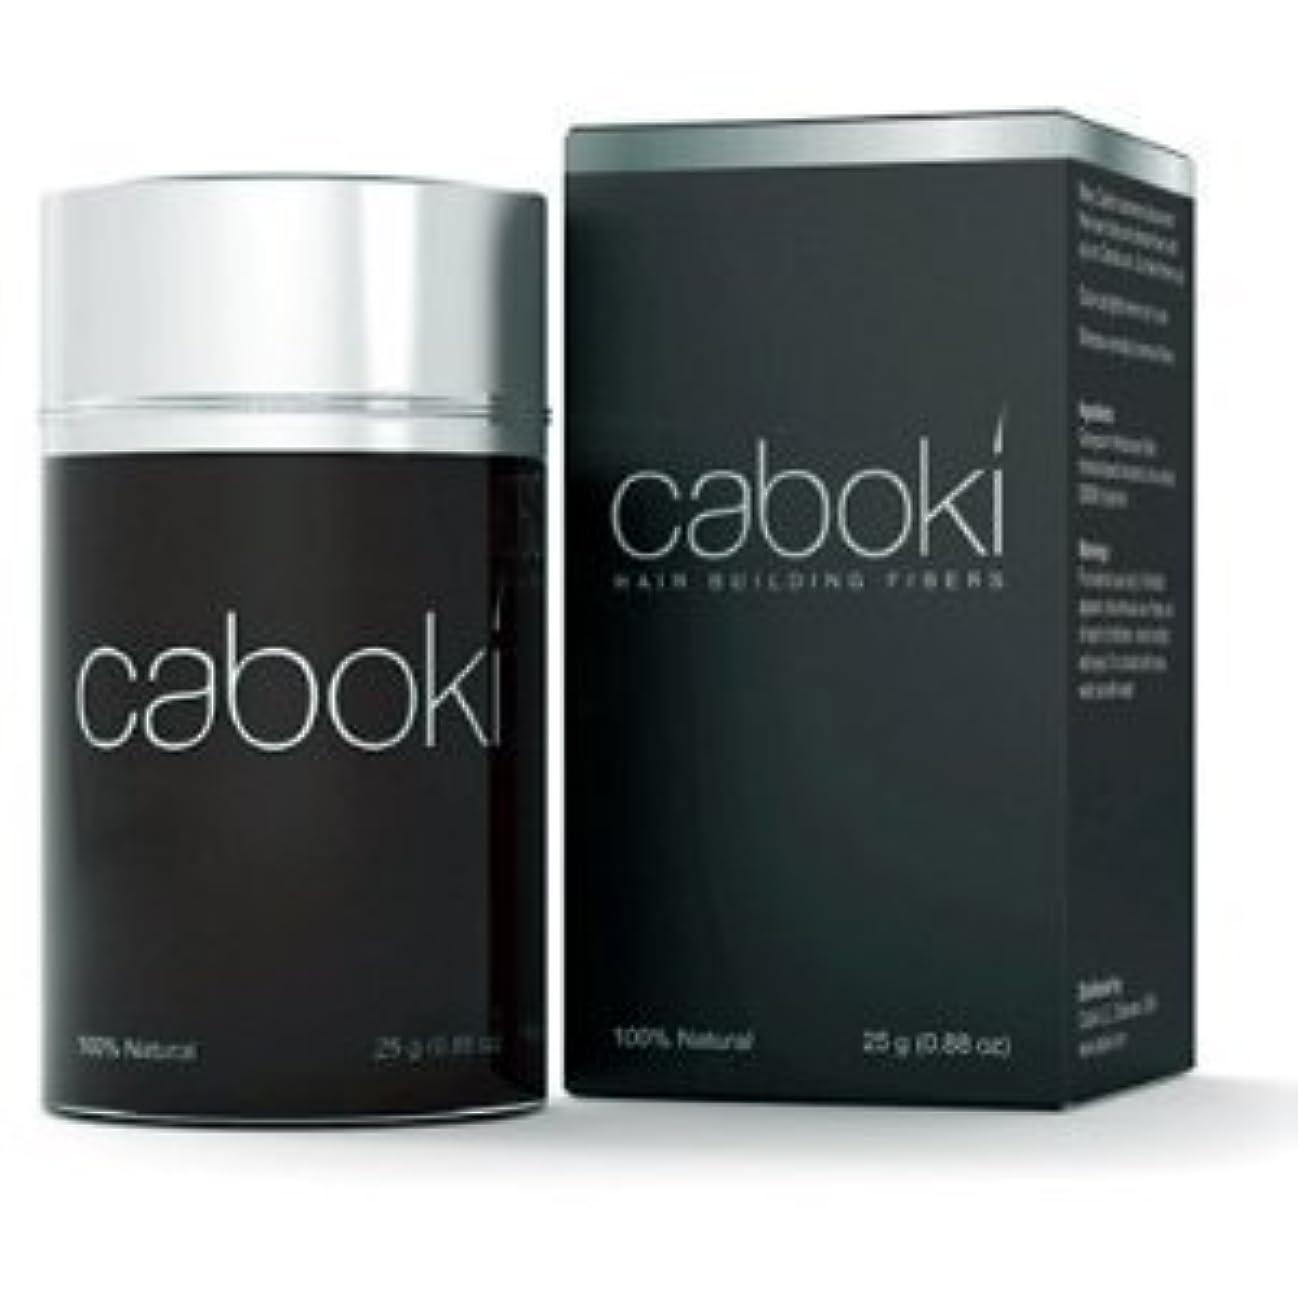 Caboki カボキコンシーラー 薄毛をカバー即座に増毛 約50日分 25g (ダークブラウン DarkBrown) [並行輸入品]